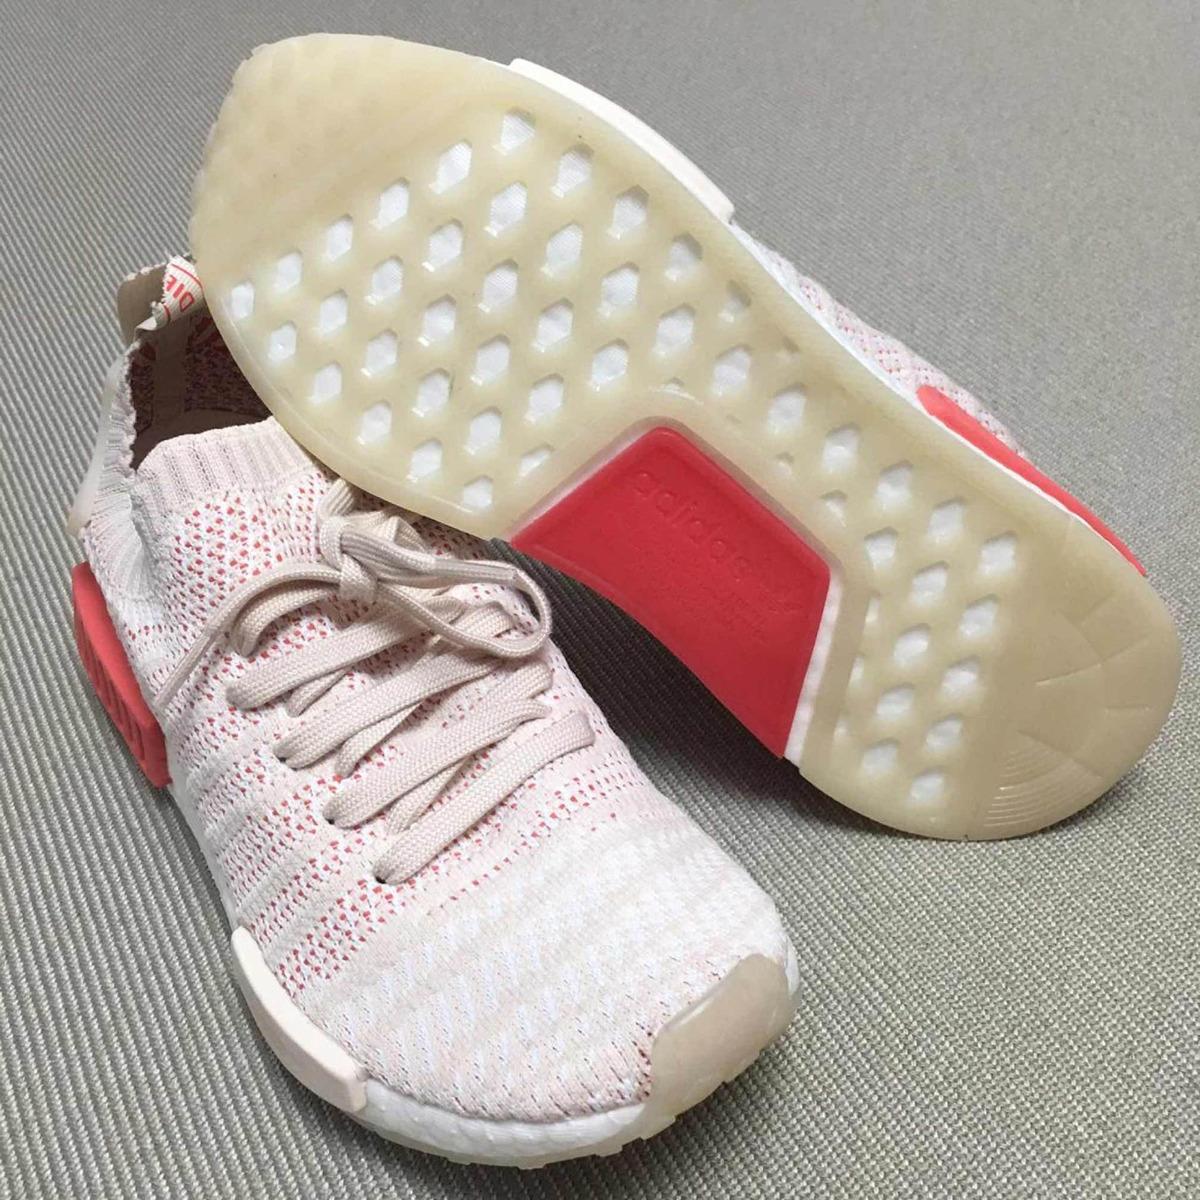 91dc49dd0 Tenis adidas Nmd R1 Stlt Pk Feminino